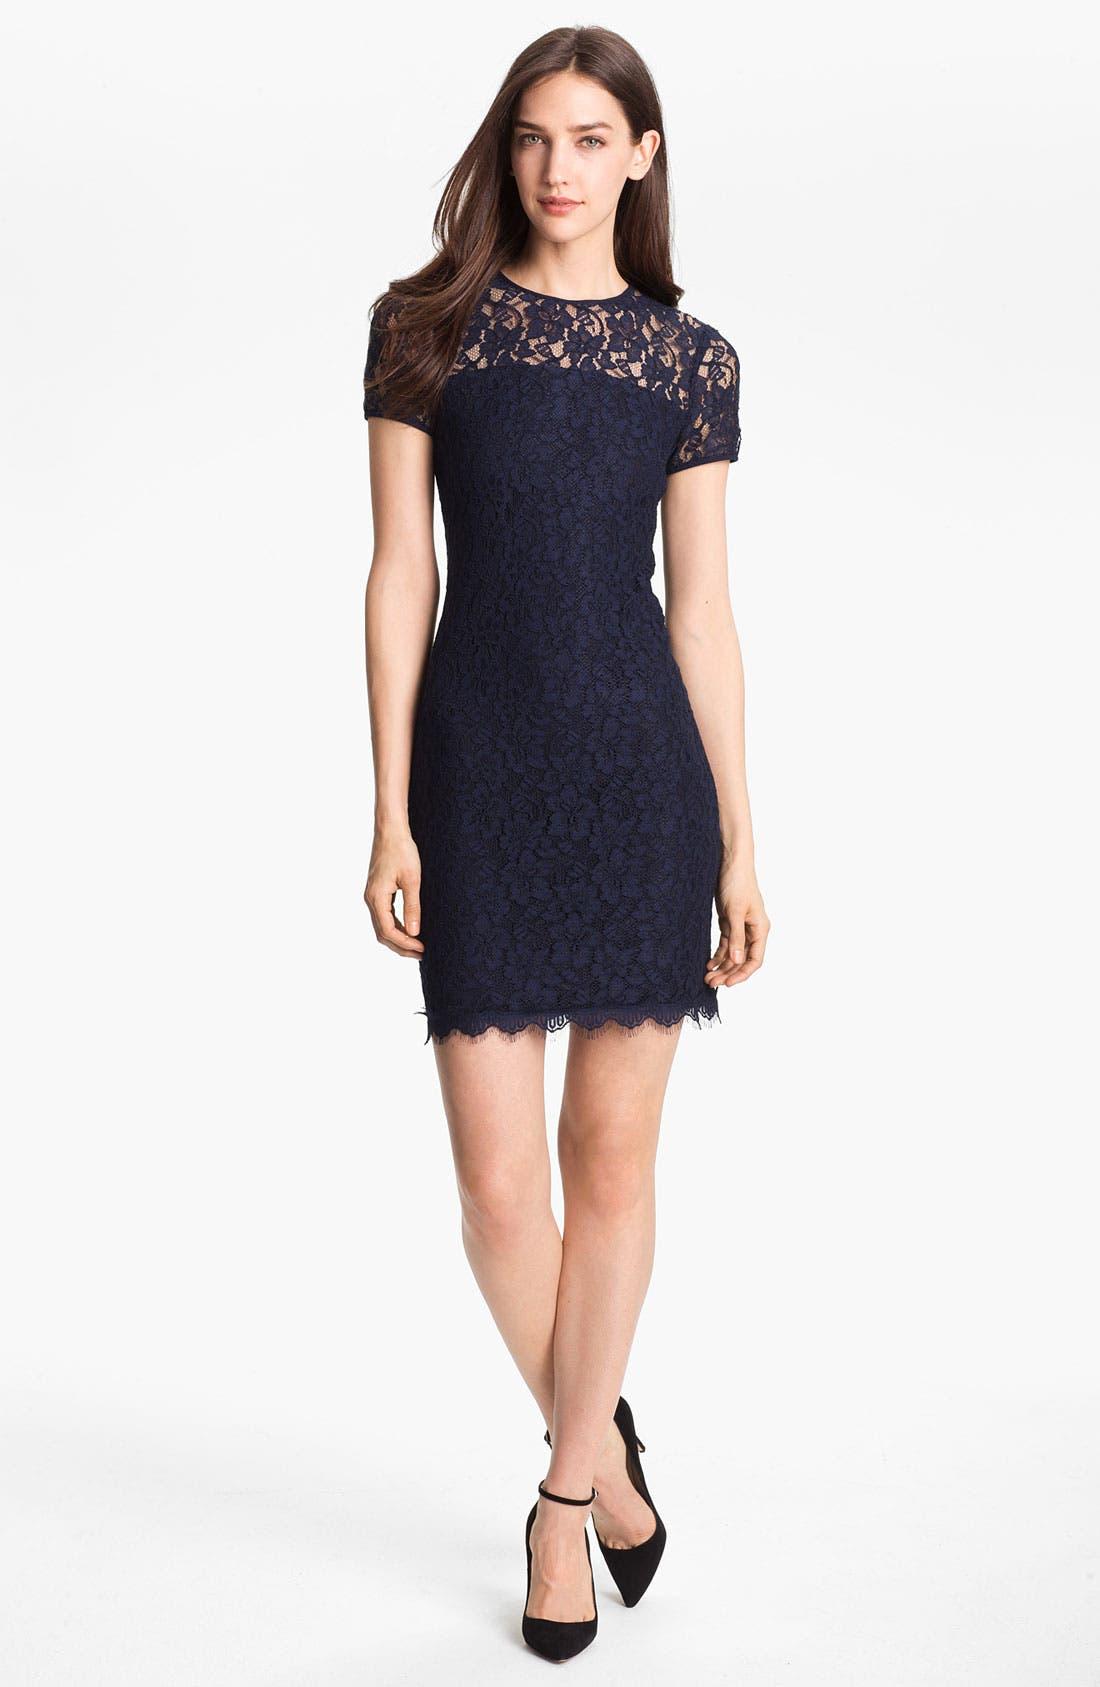 Main Image - Diane von Furstenberg 'Barbie' Lace Shift Dress